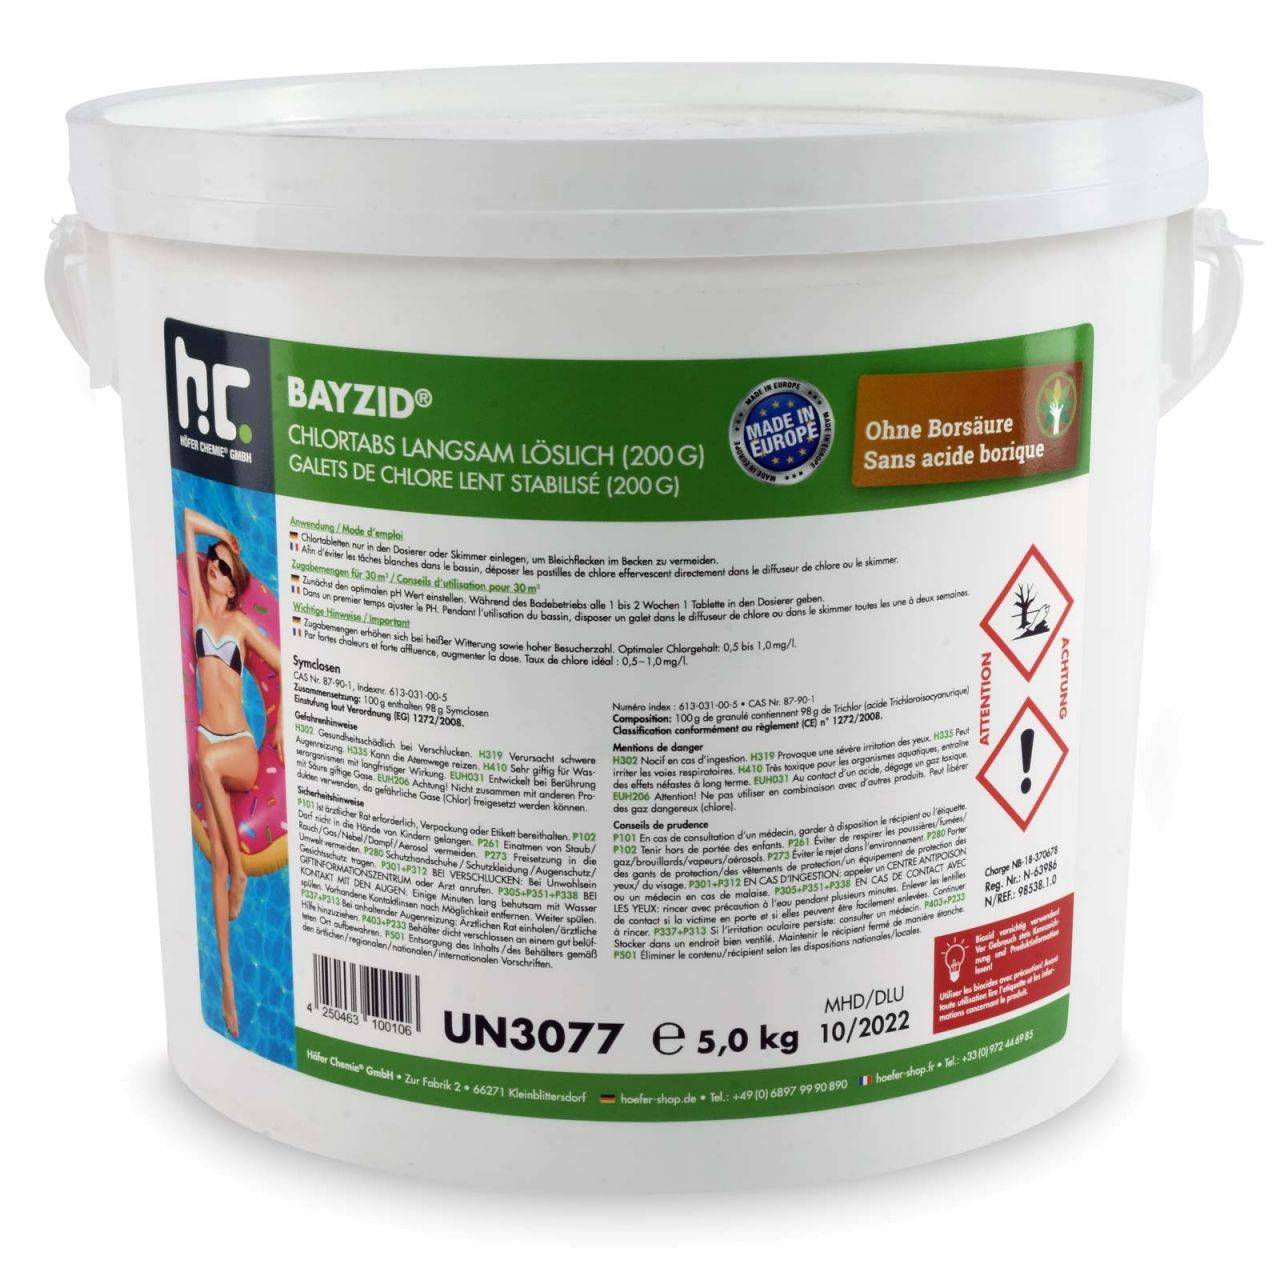 BAYZID 10 kg Bayzid® Galets de chlore lent (200g) (2 x 5 kg)